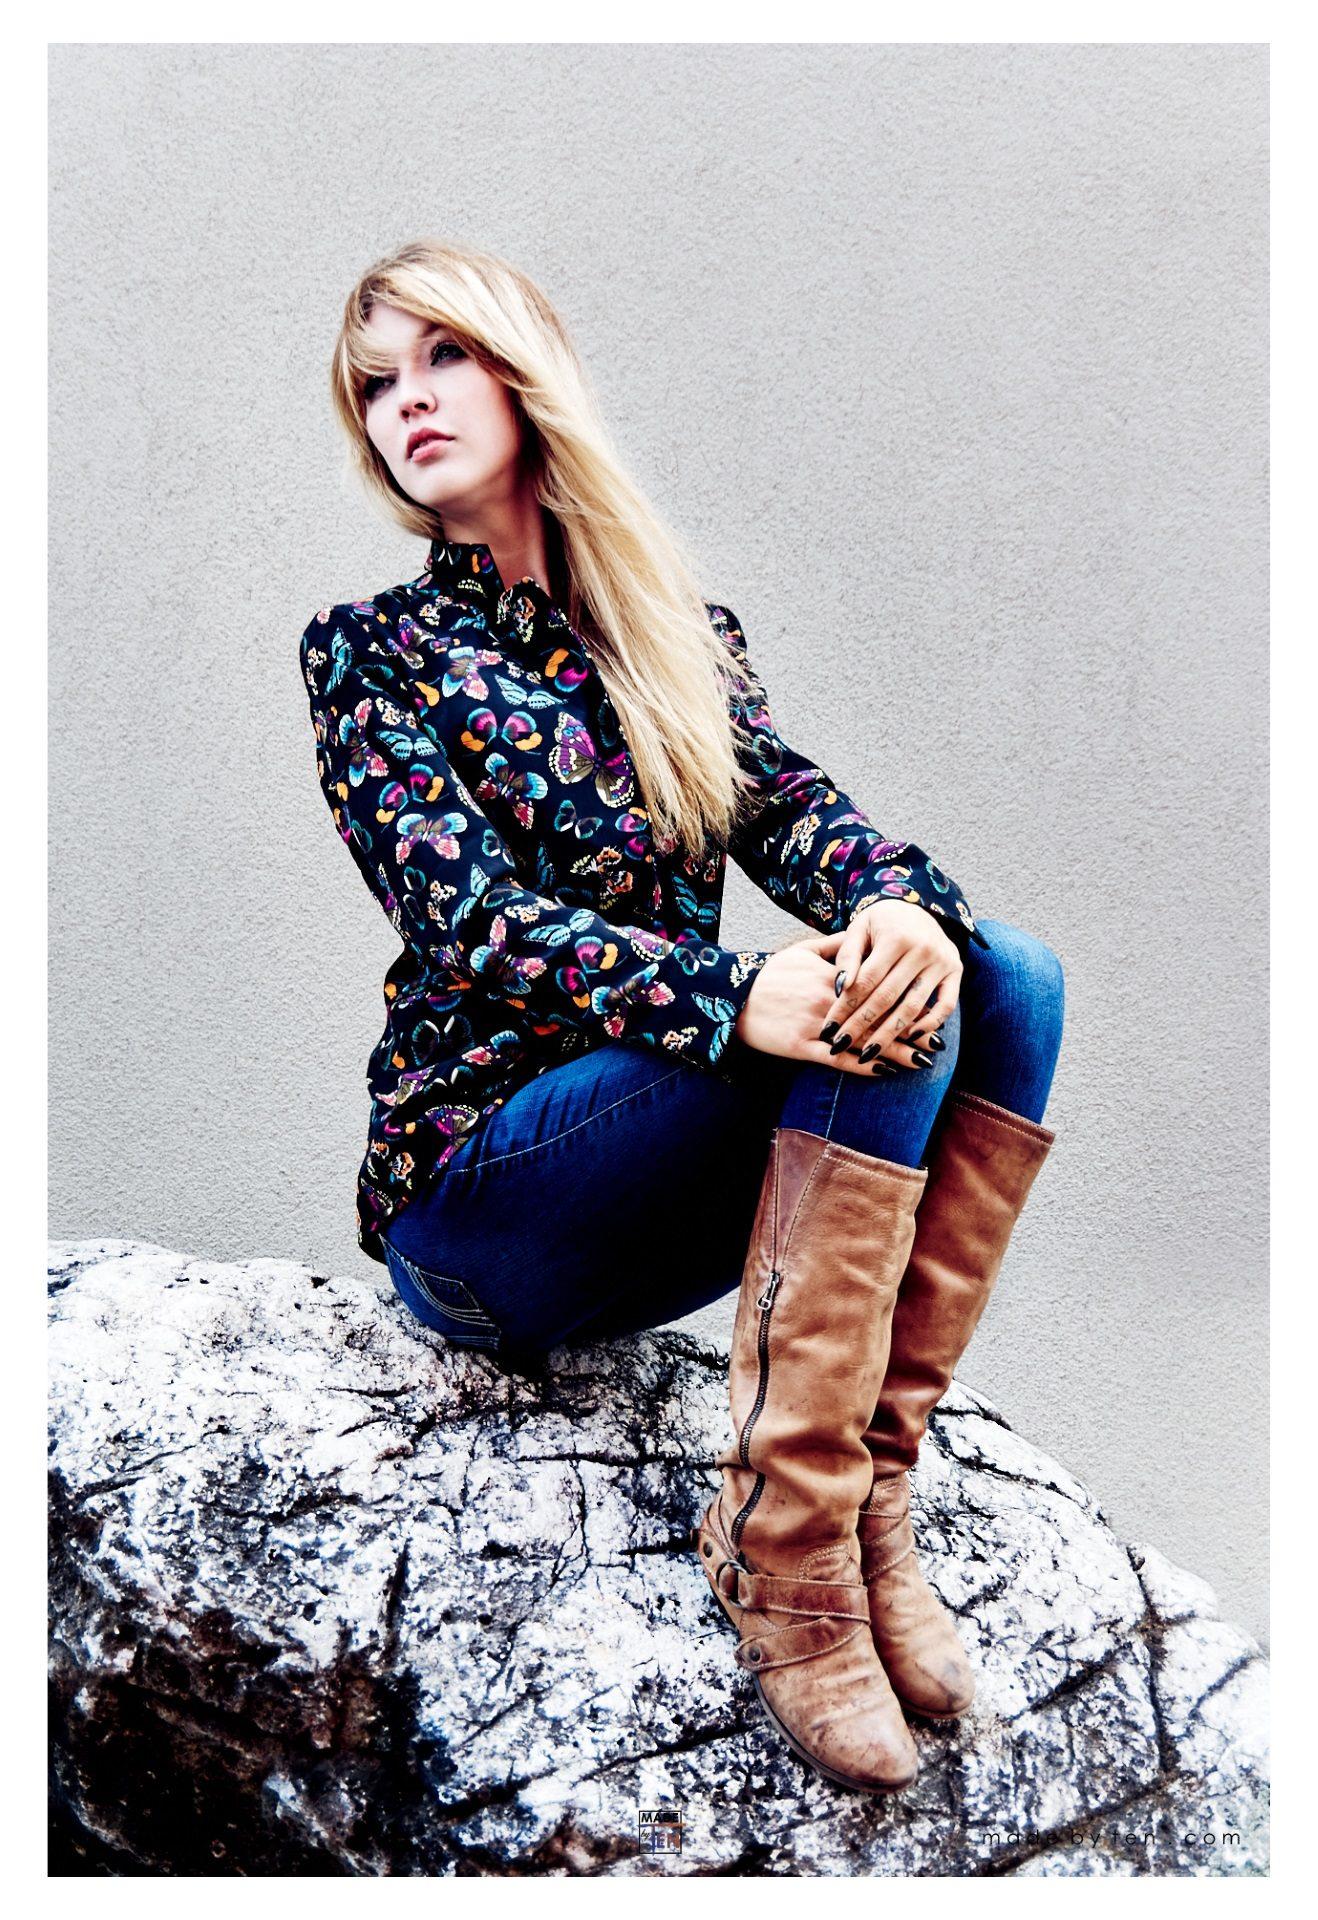 Woman Rock Posing - GTA Women Lifestyle Photography